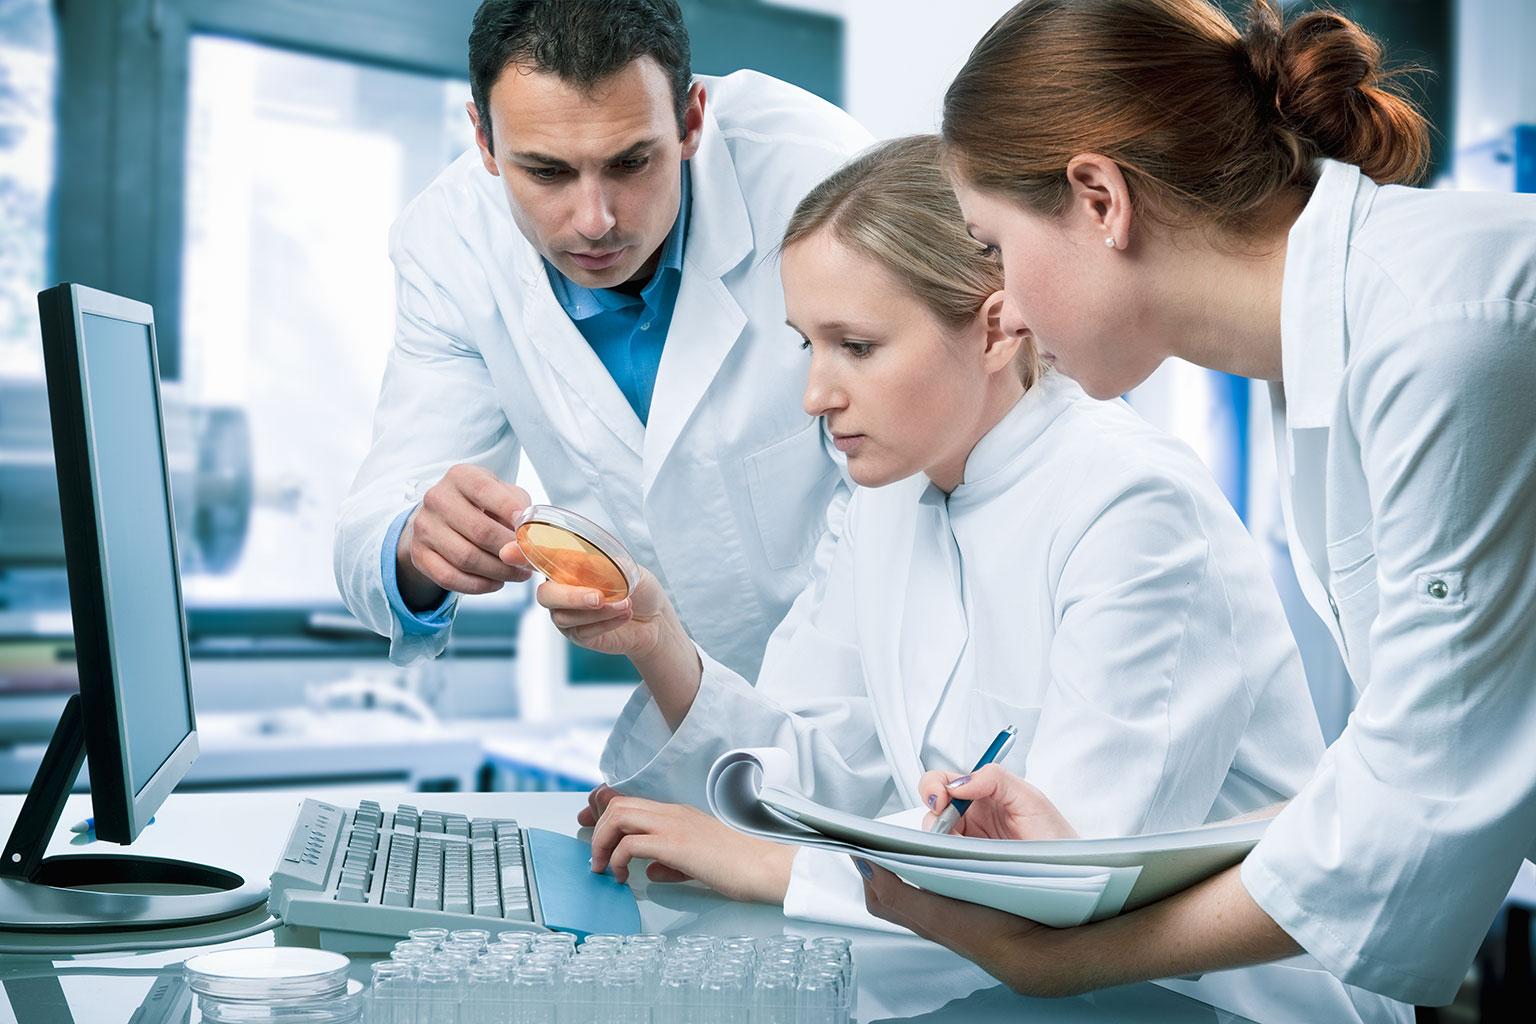 Researchers gathered around a petri dish and monitor